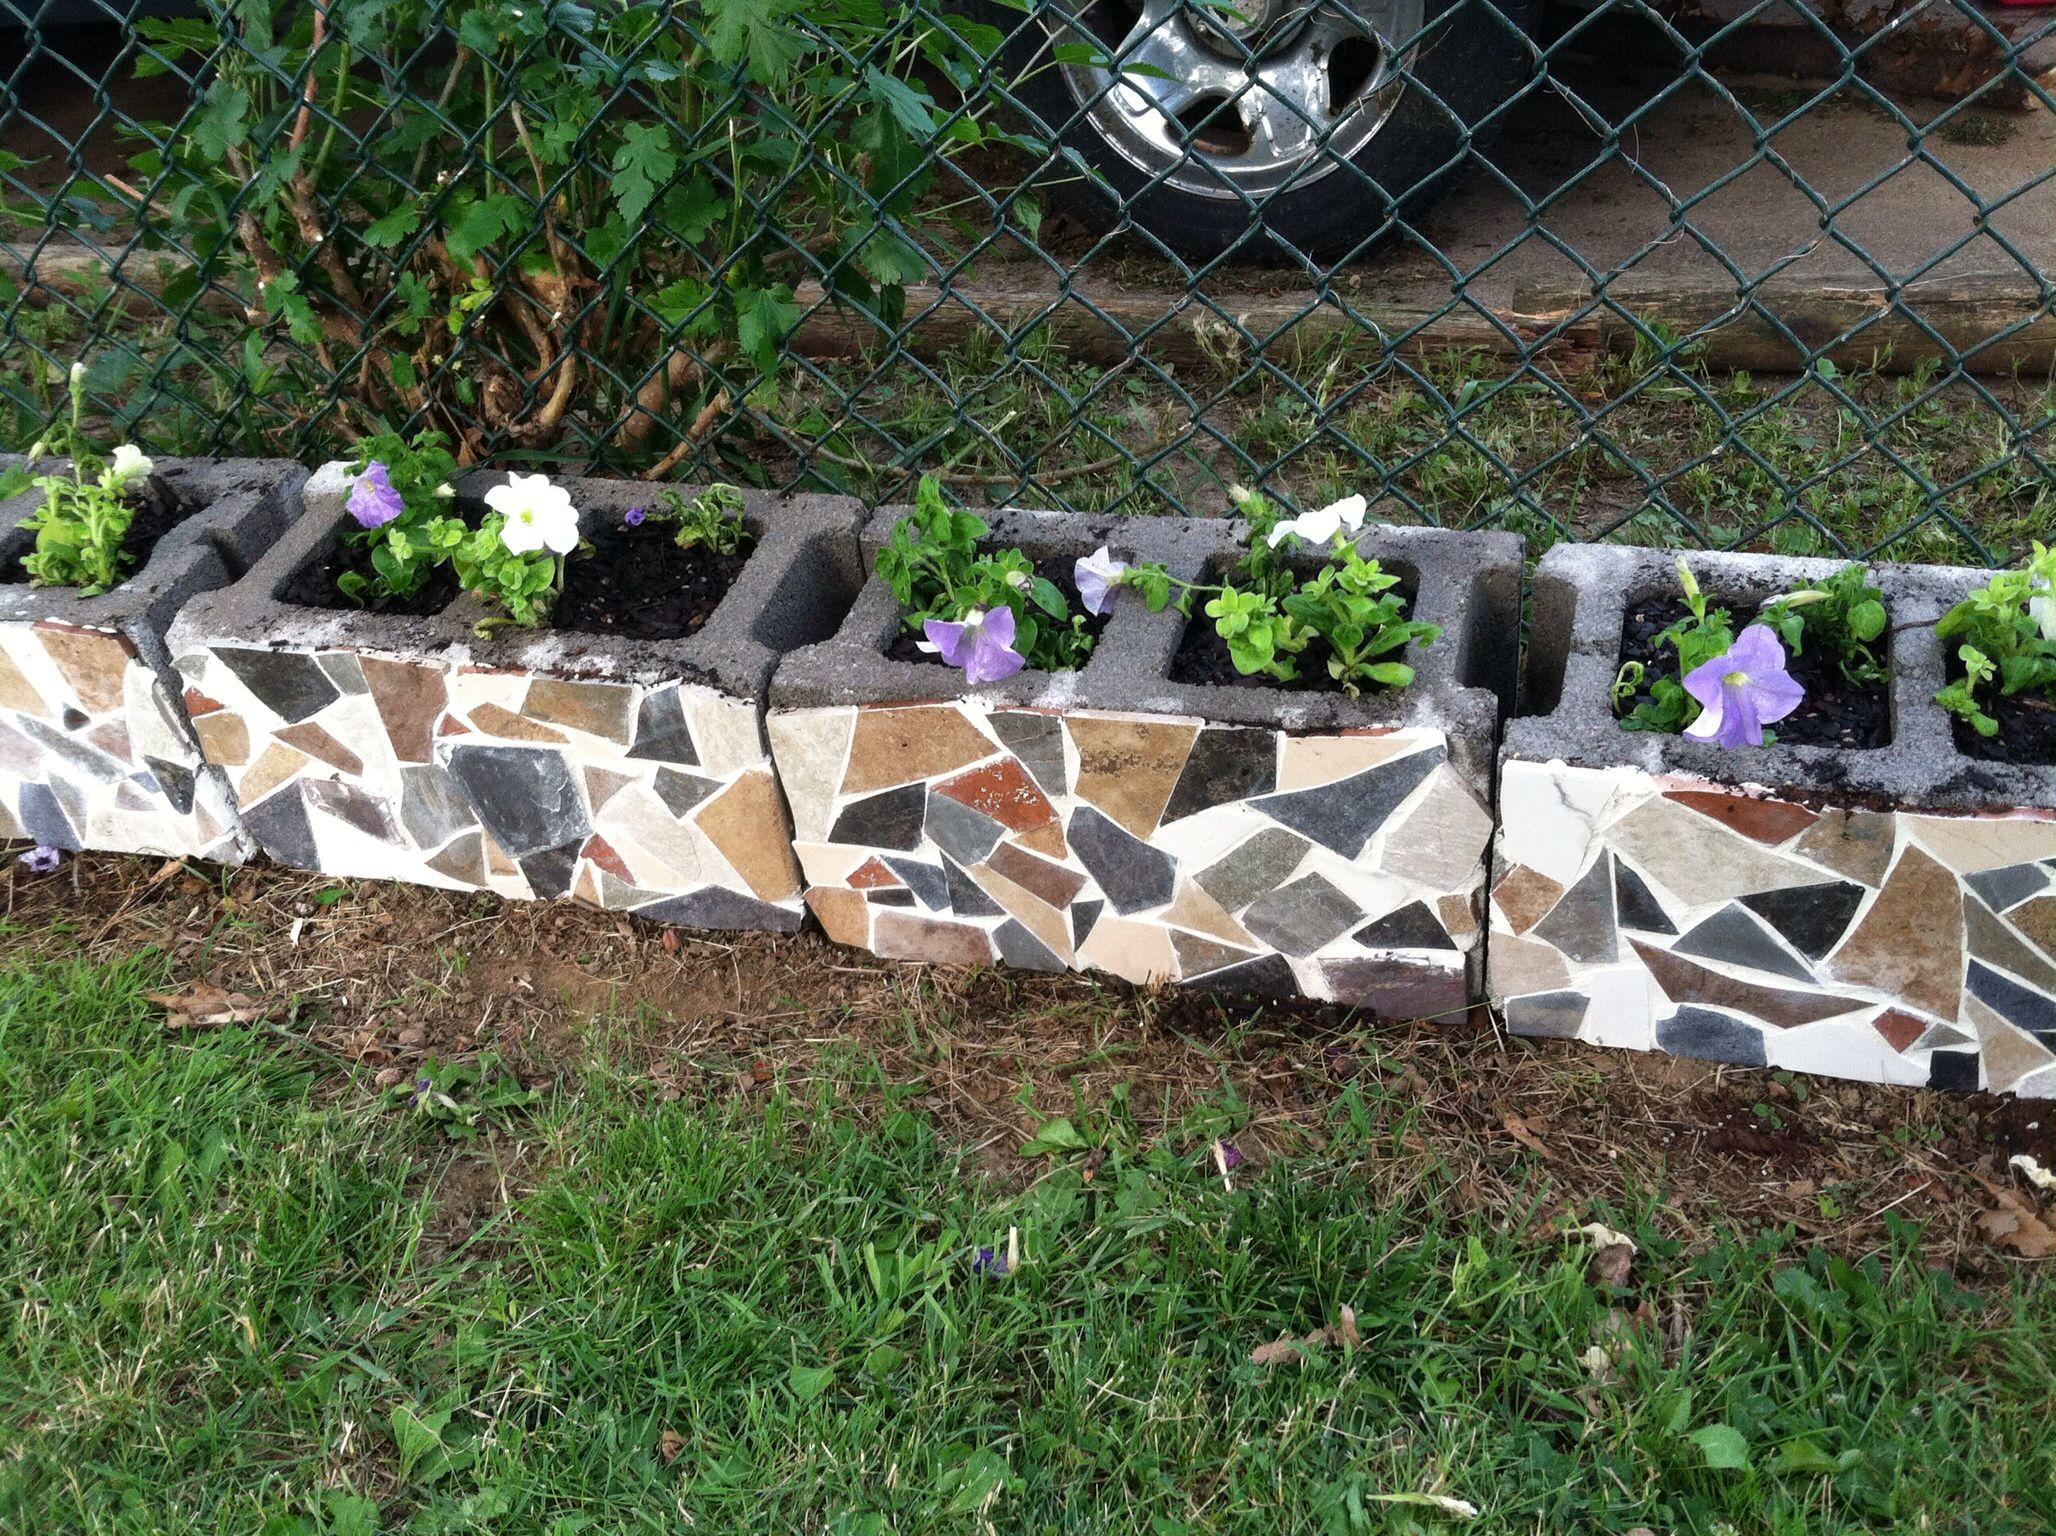 Mosaic cinder blocks completed :)